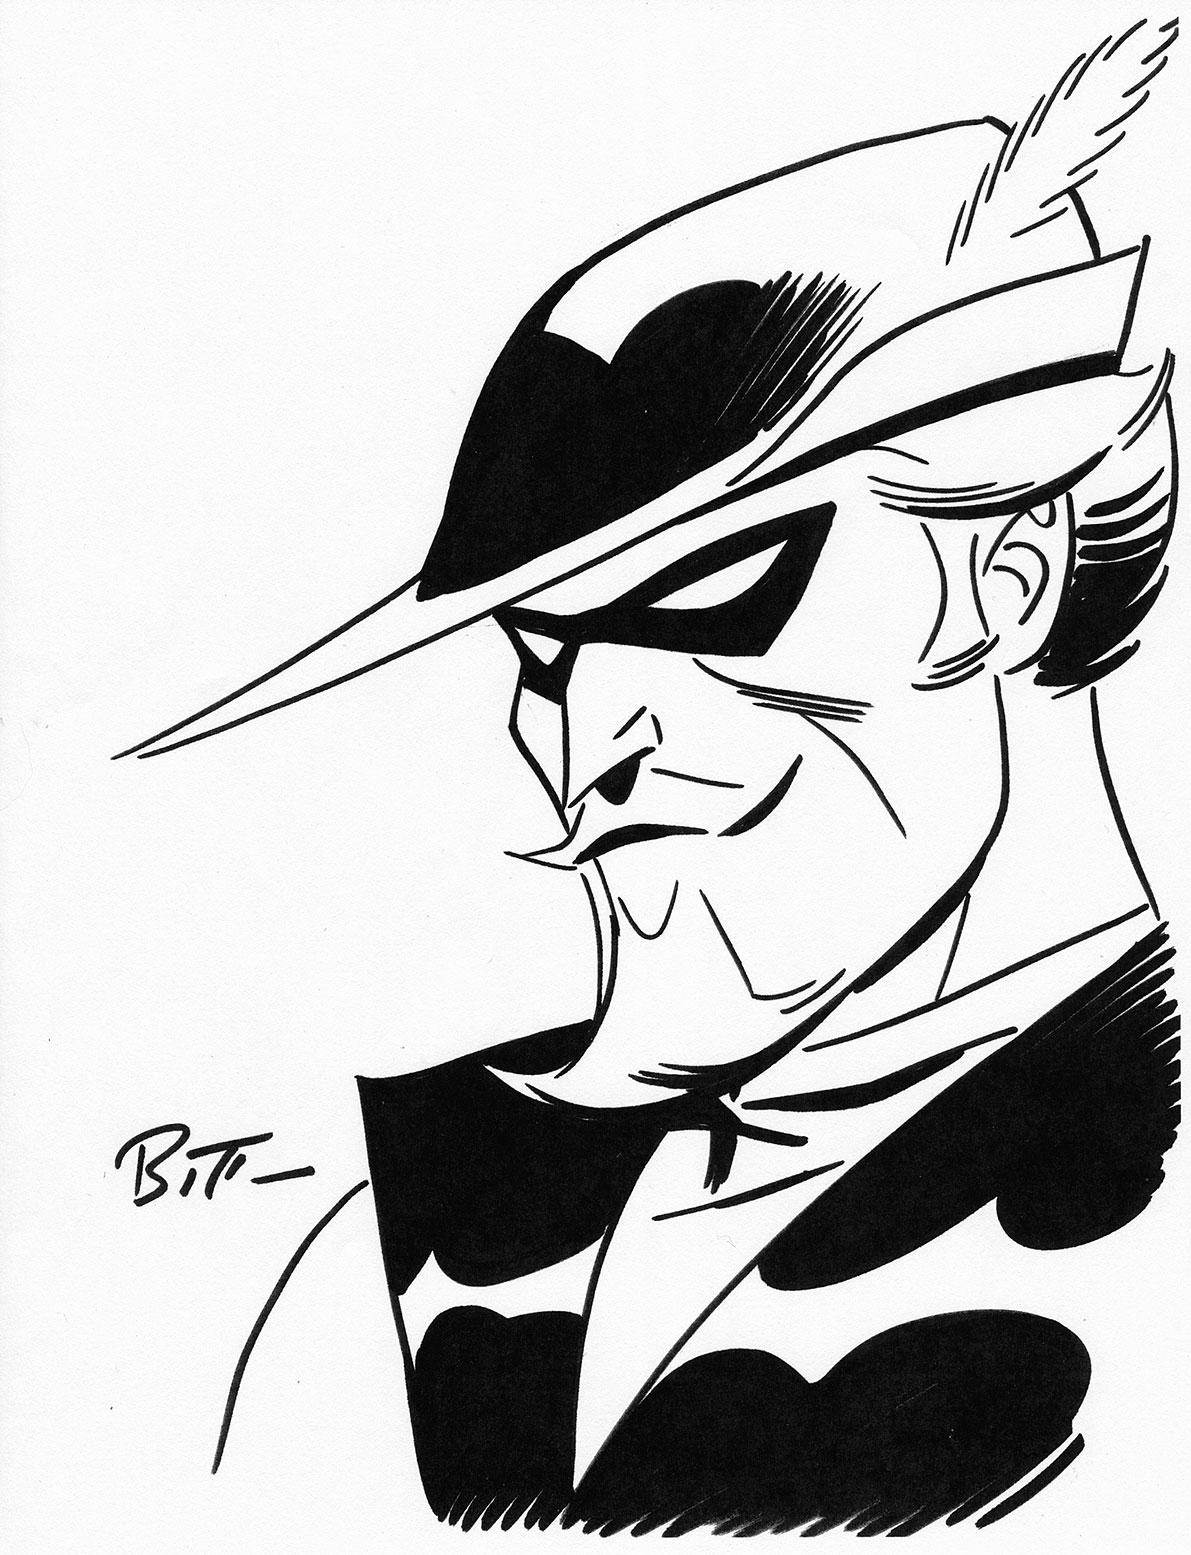 1191x1555 Bruce Timm 2016 Green Arrow Sketch Art